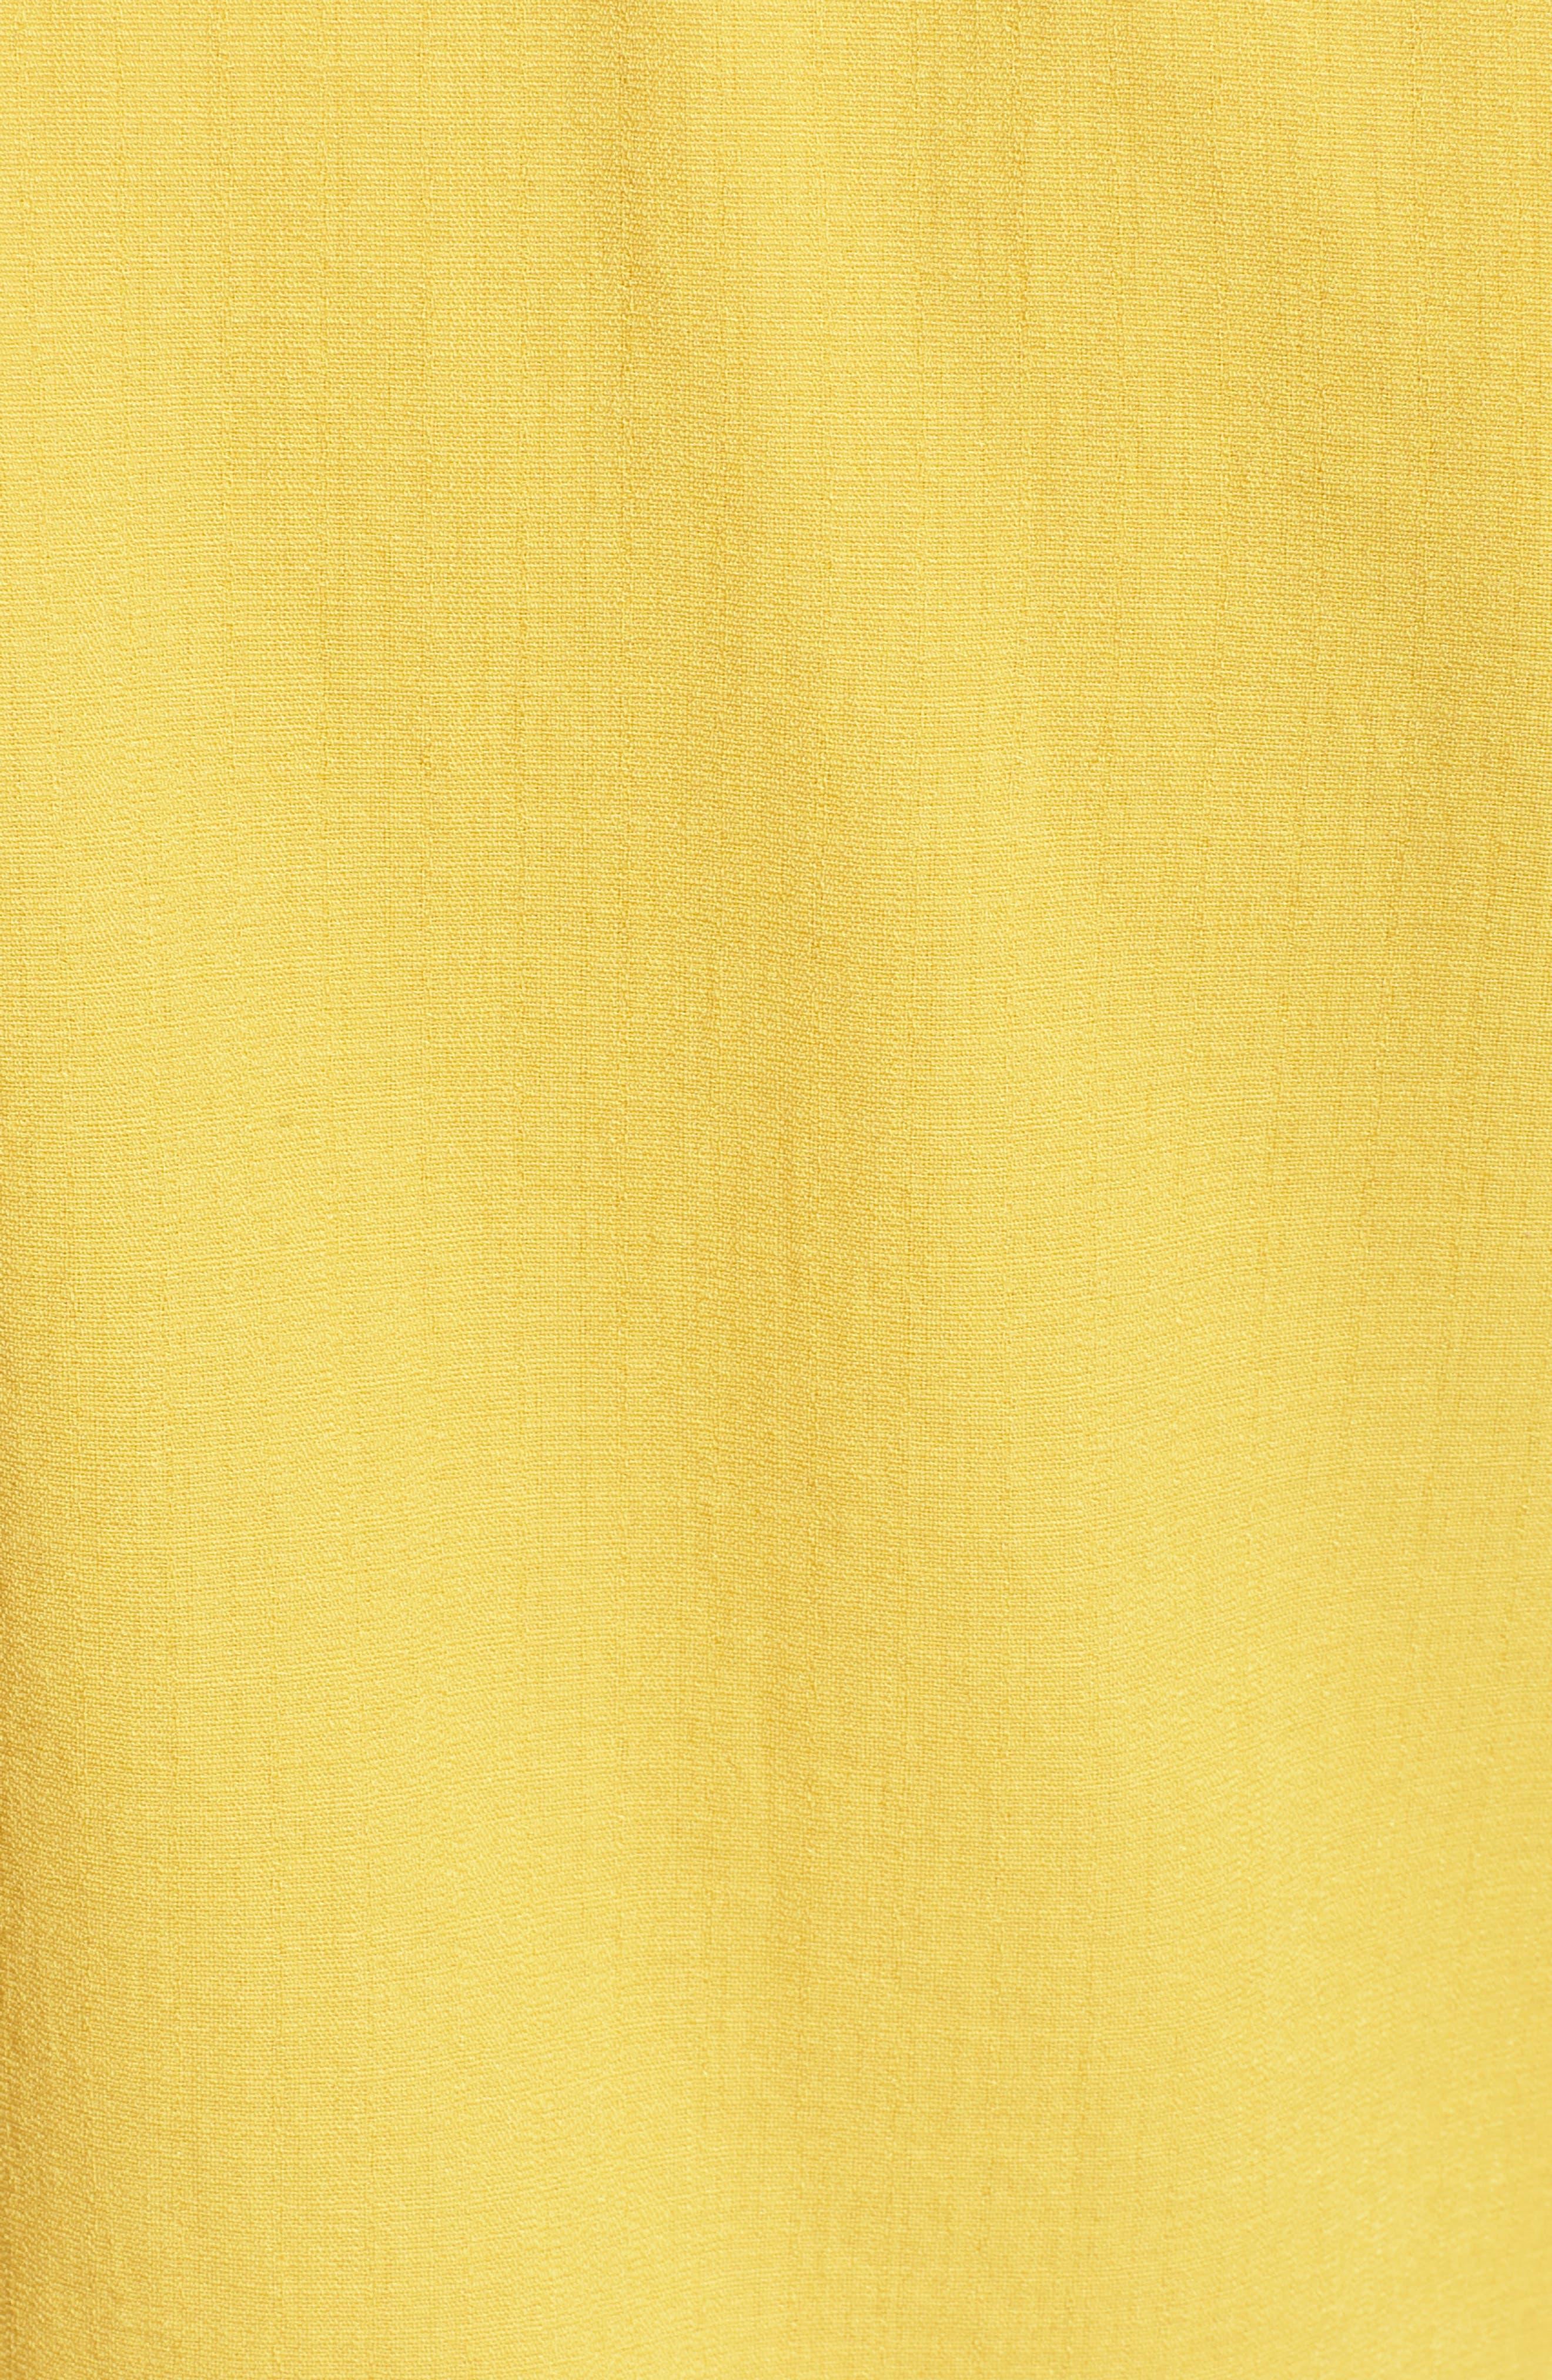 Ruffle Sleeve Crop Top,                             Alternate thumbnail 6, color,                             Marigold